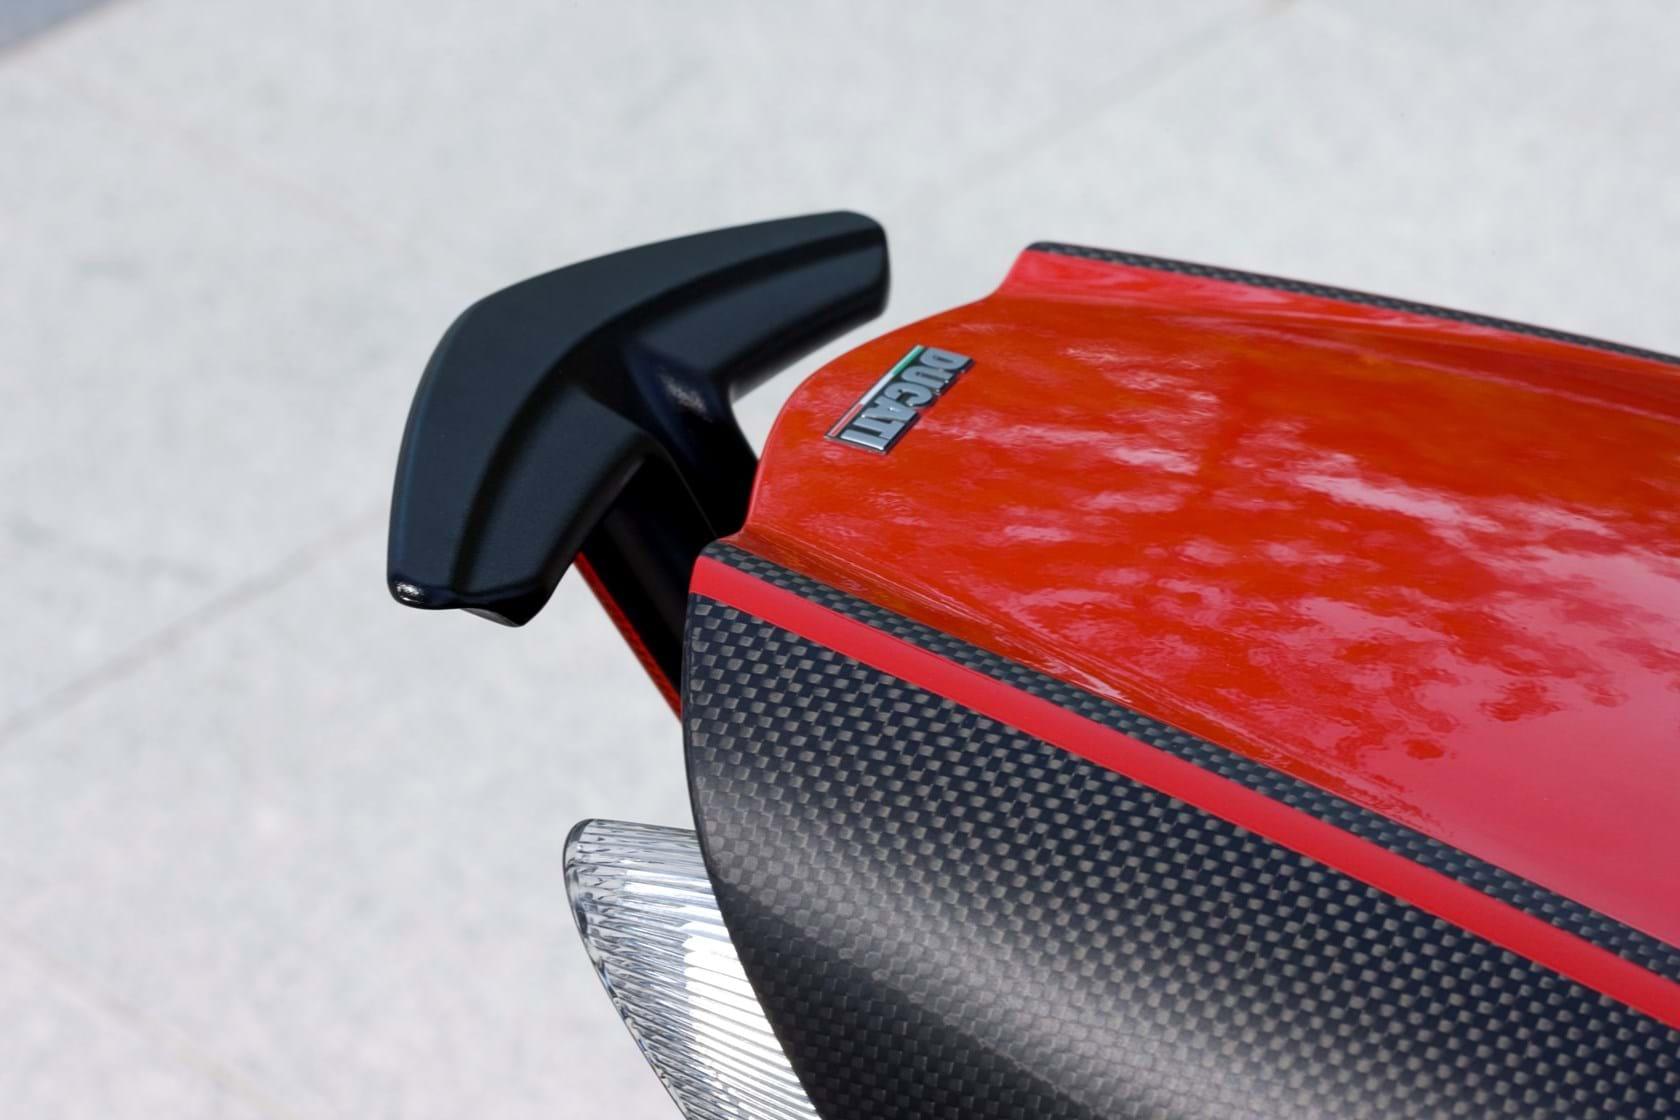 For Sale Ducati Diavel Carbon The Bike Market